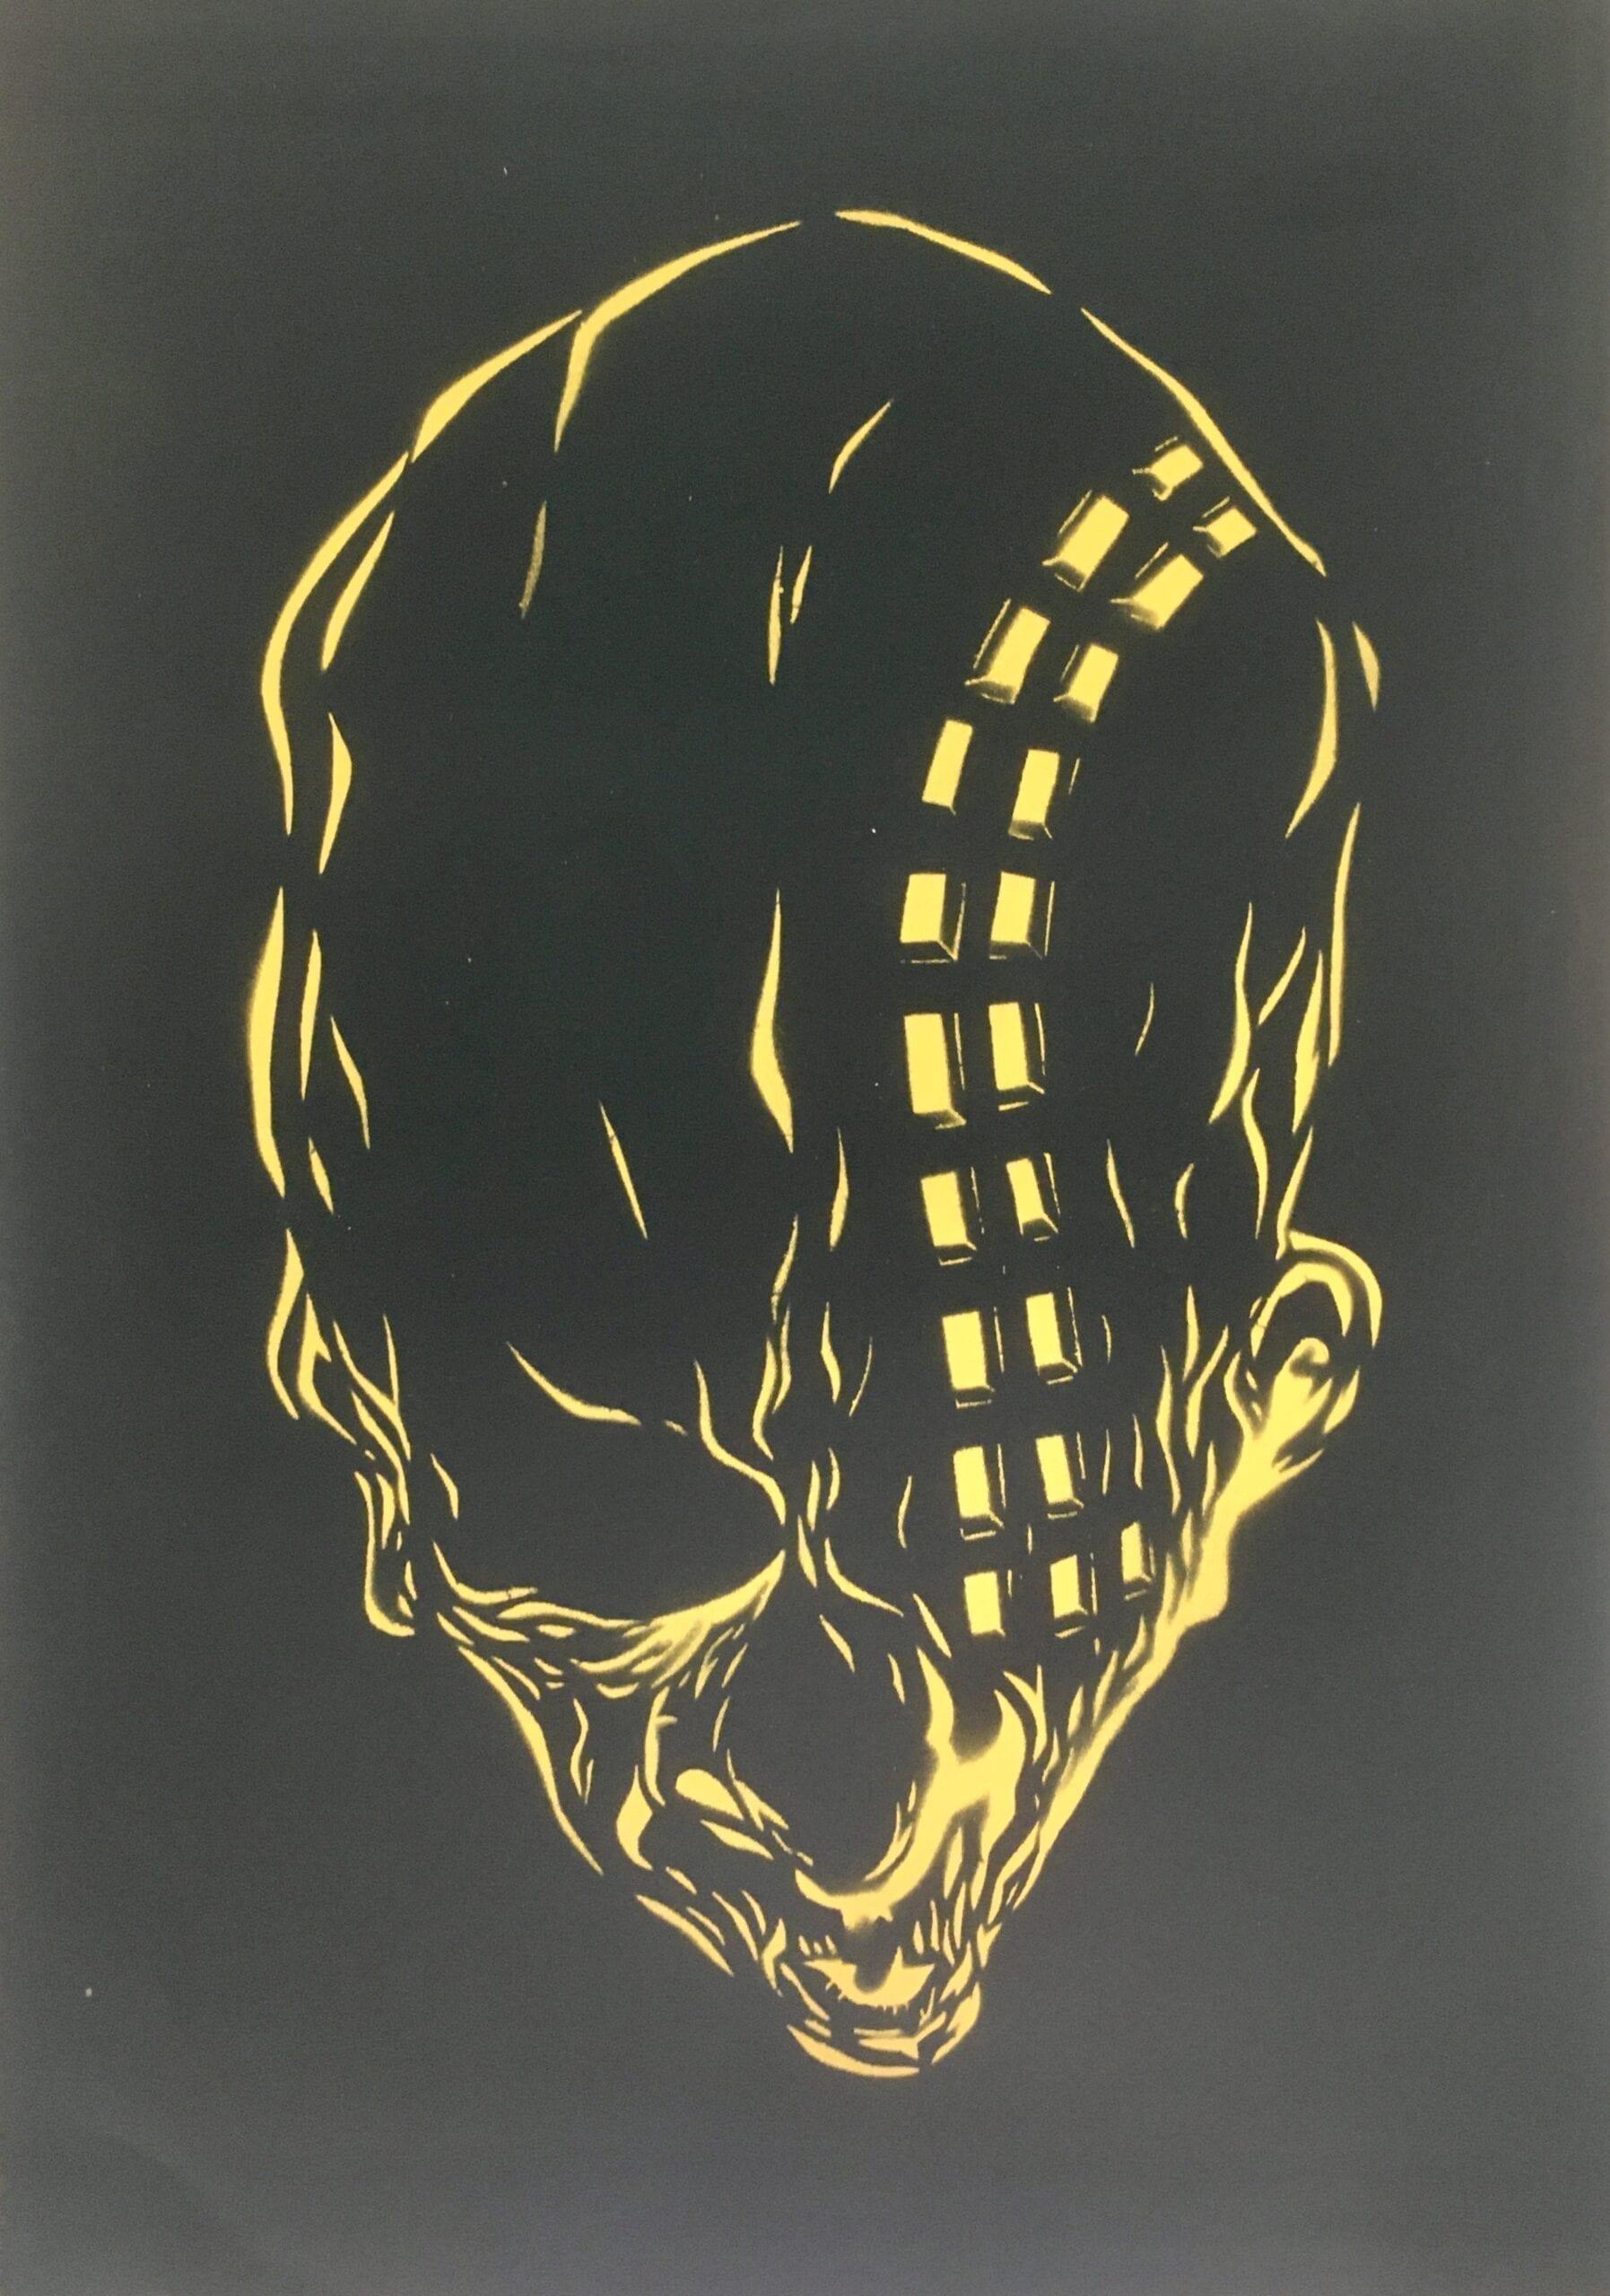 Urban Prophecy by Robert Obert stencil